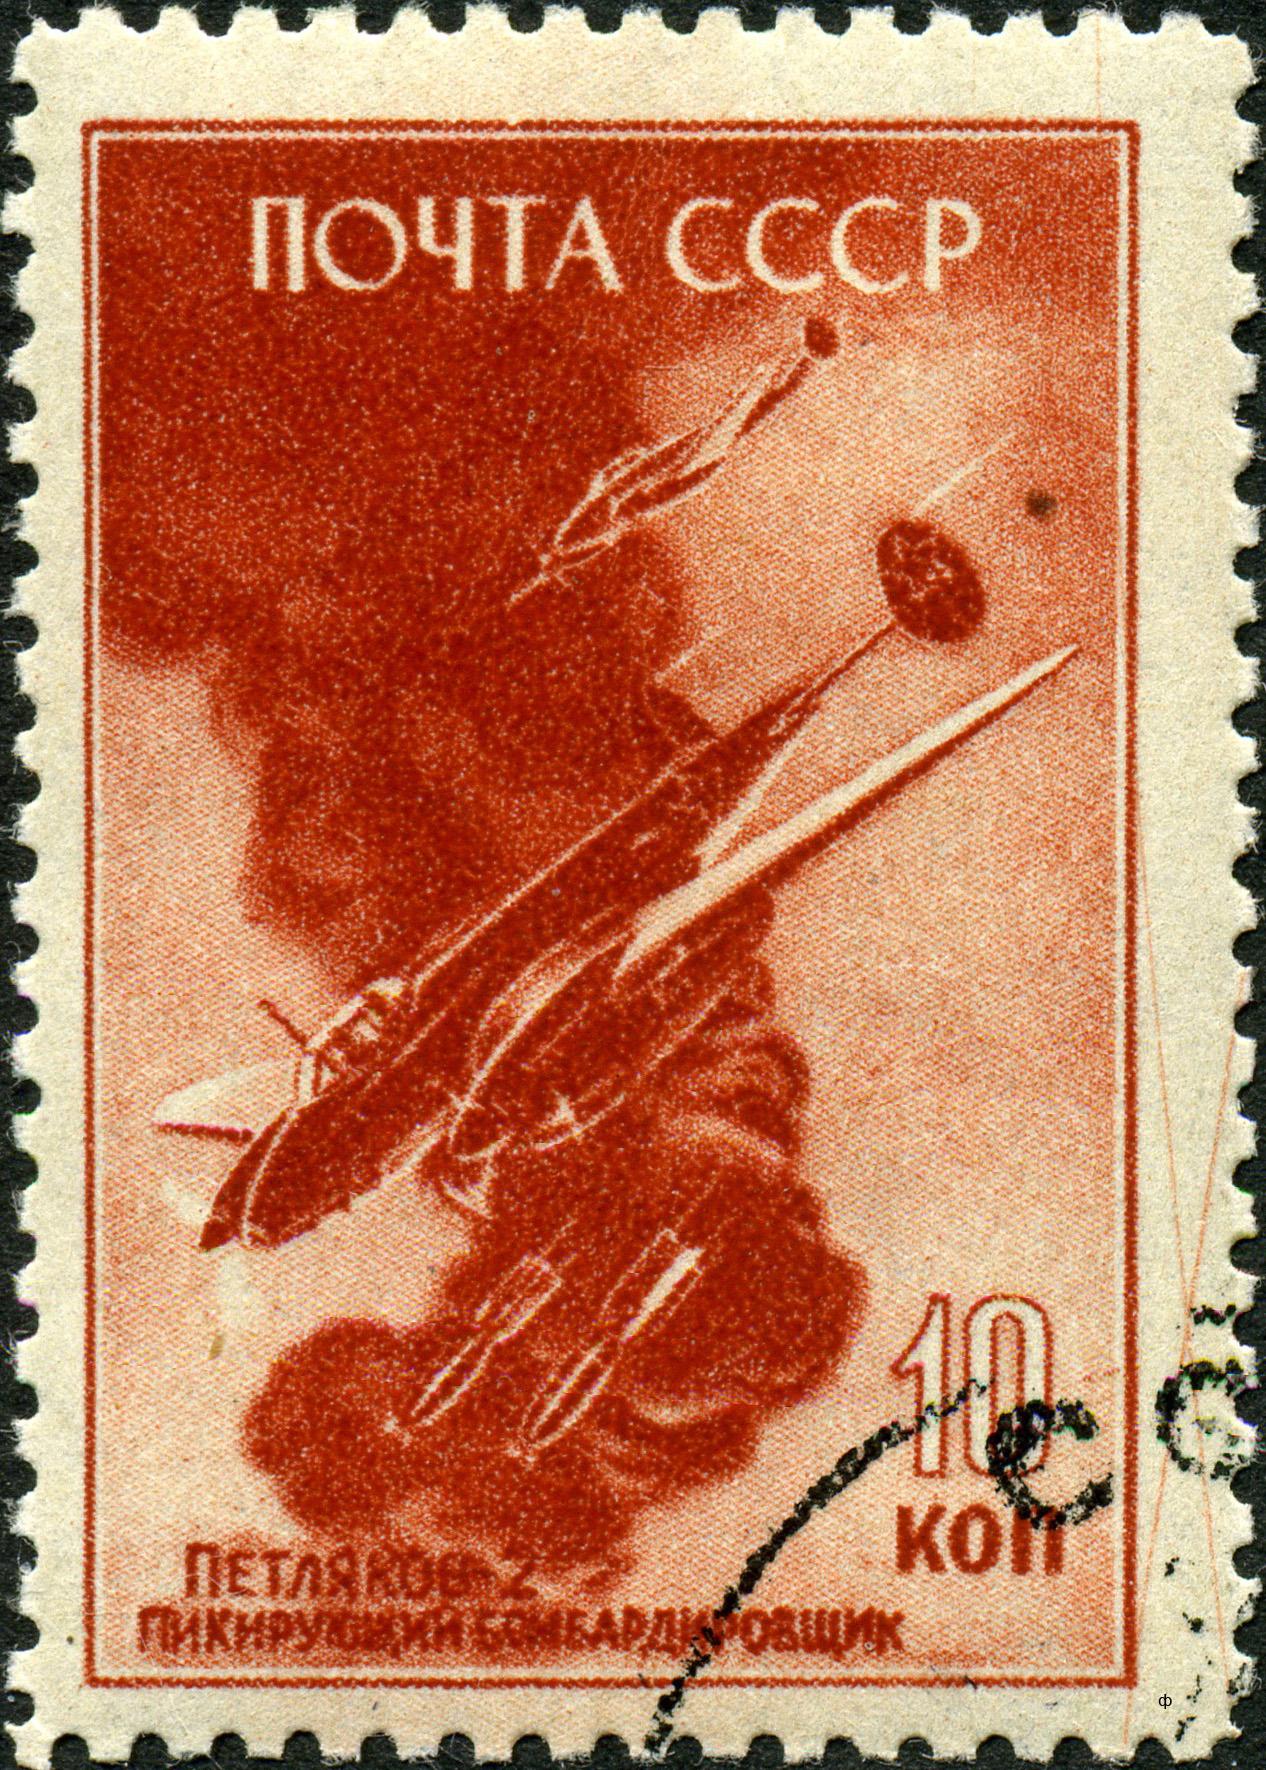 Soviet Stamp celebrating the Petlyakov Pe 2 0A